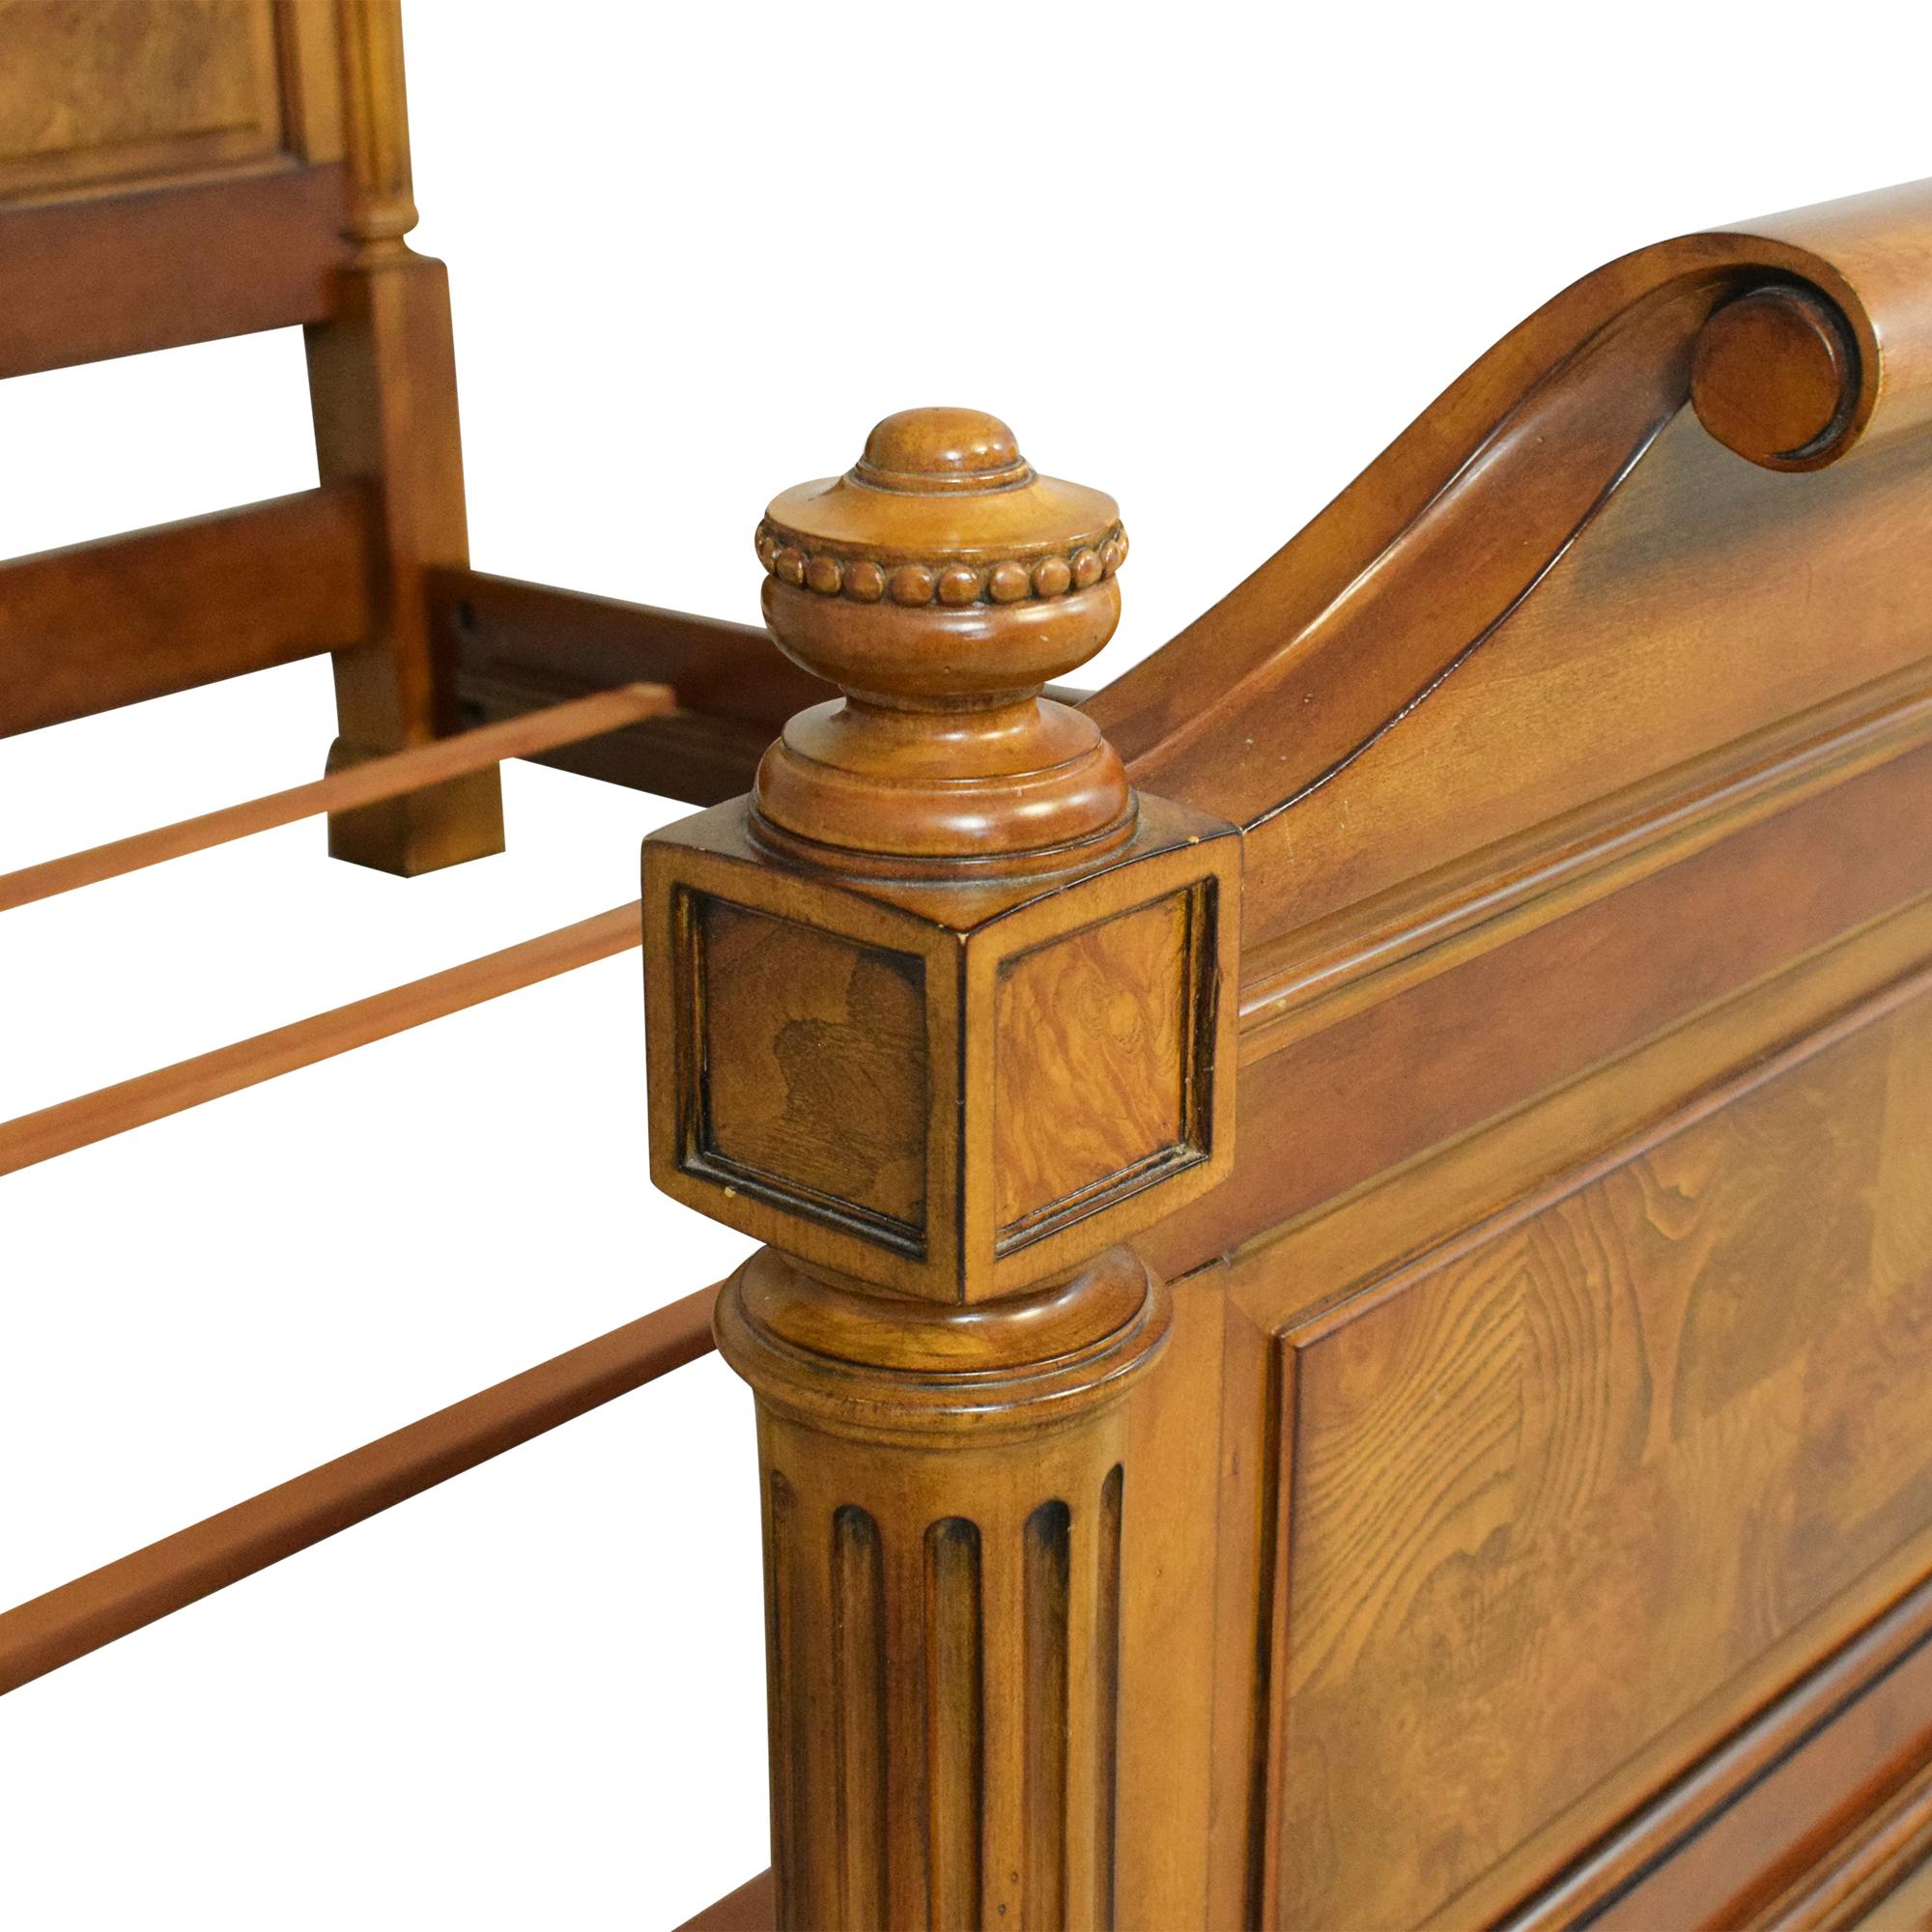 Ethan Allen Ethan Allen Townhouse Wentworth Queen Panel Bed price